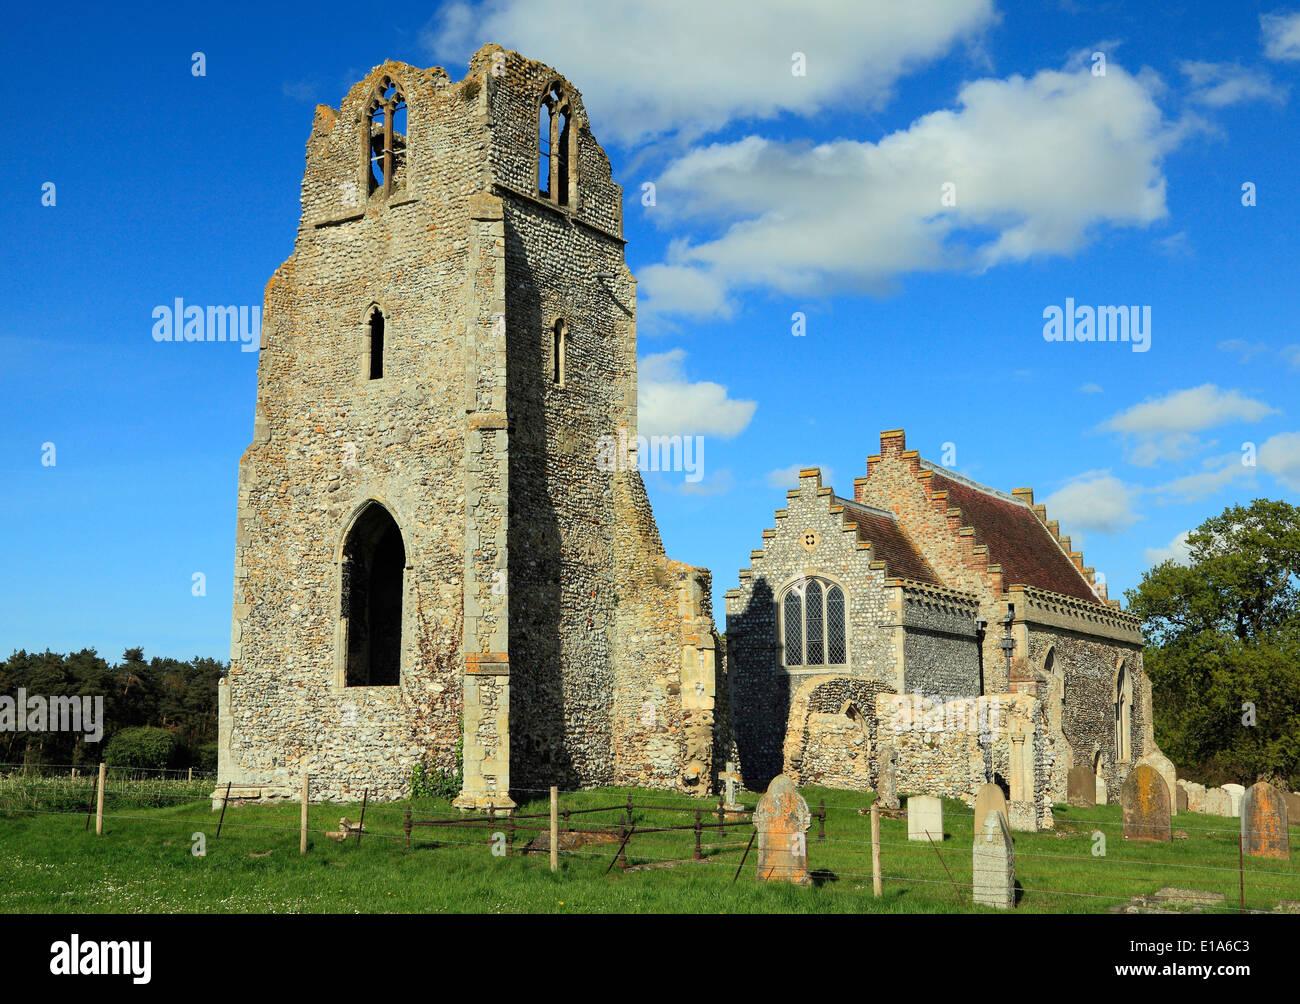 Barningham, Norfolk, parzialmente in rovina chiesa parrocchiale medievale, chiese inglese England Regno Unito Immagini Stock